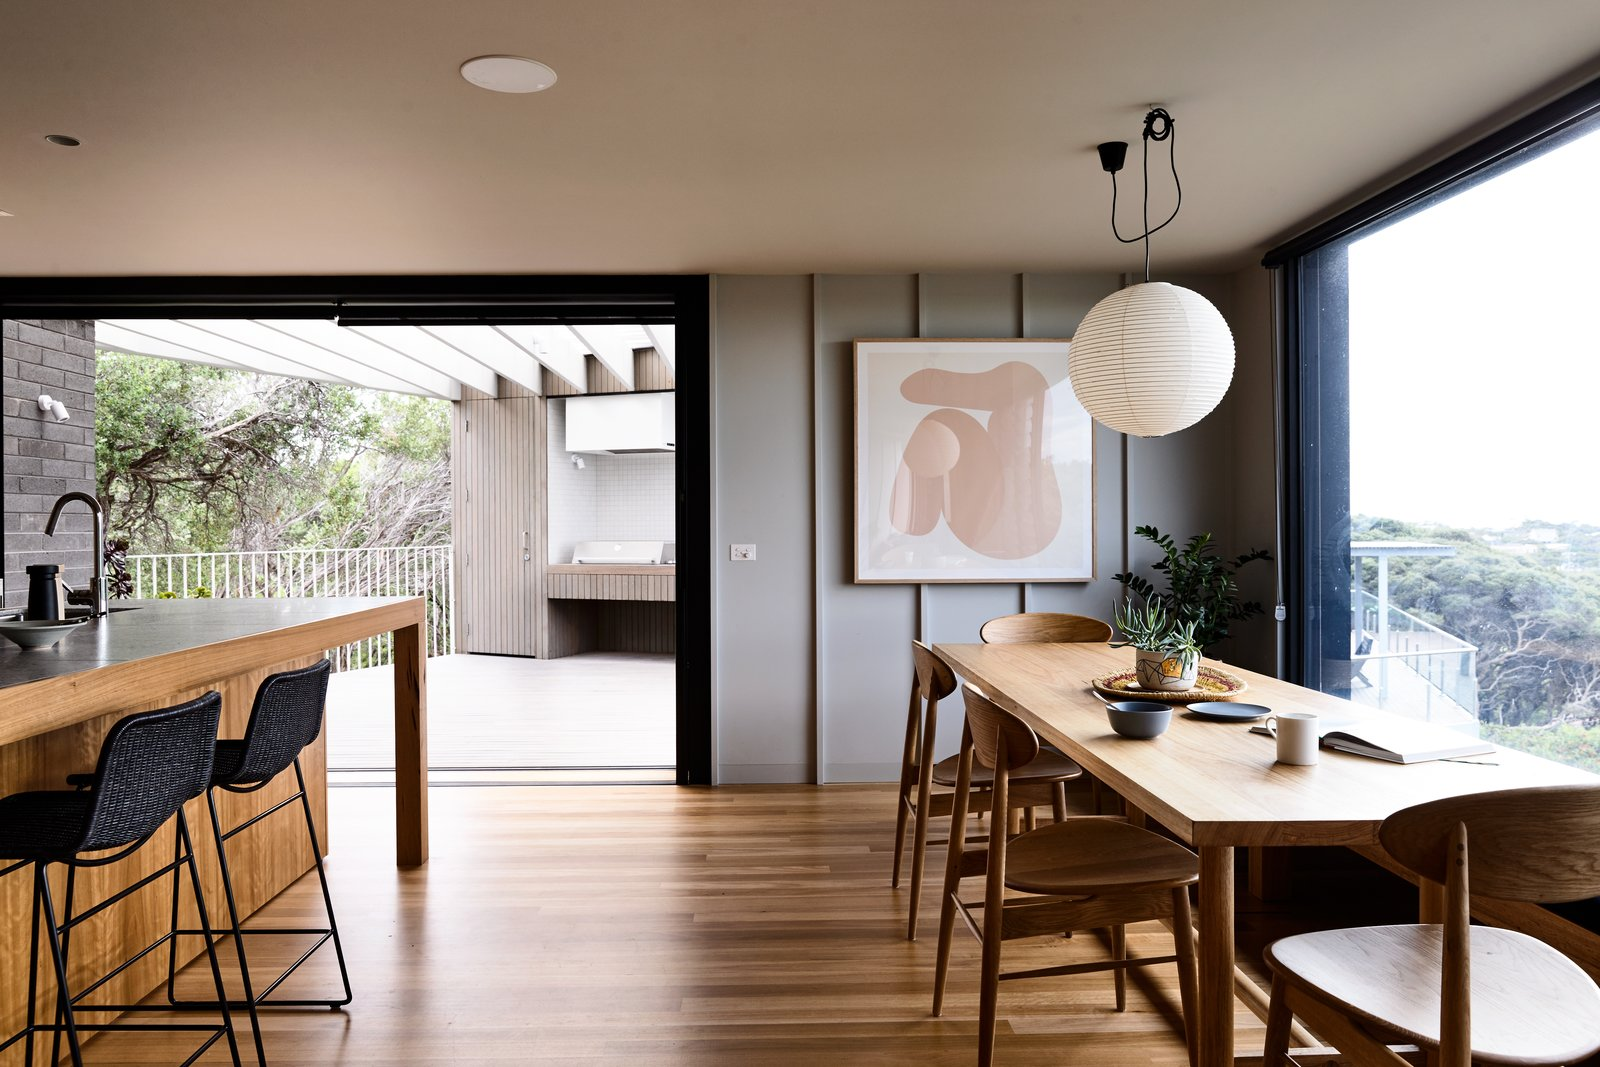 Sorrento House Figureground Architecture Kitchen Dining Room